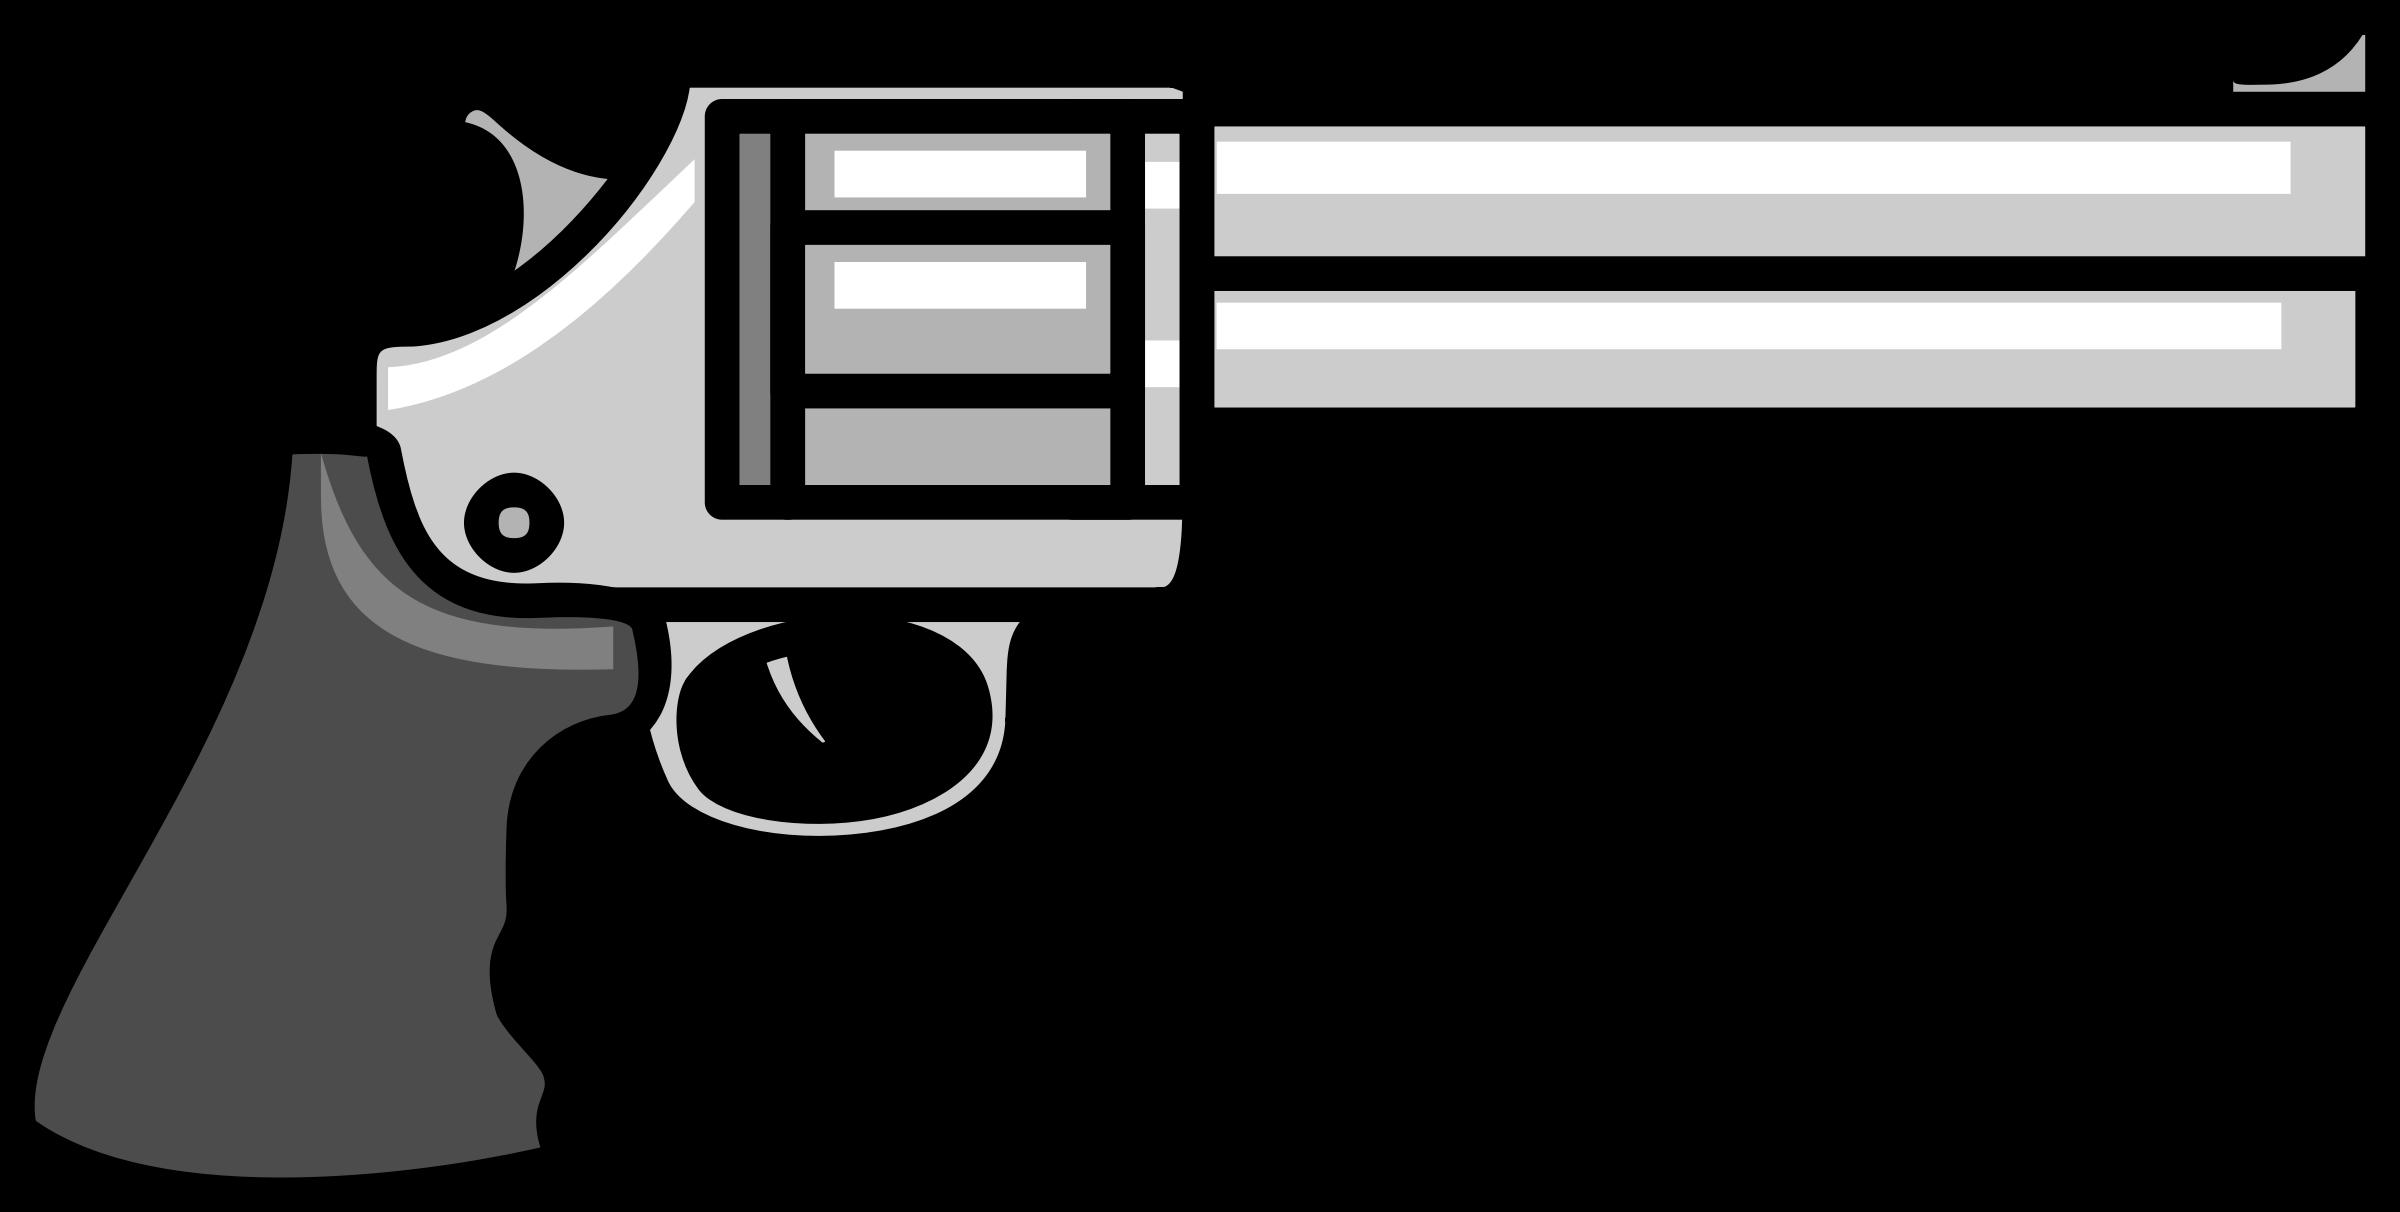 Clipart gun pdf. Big image png